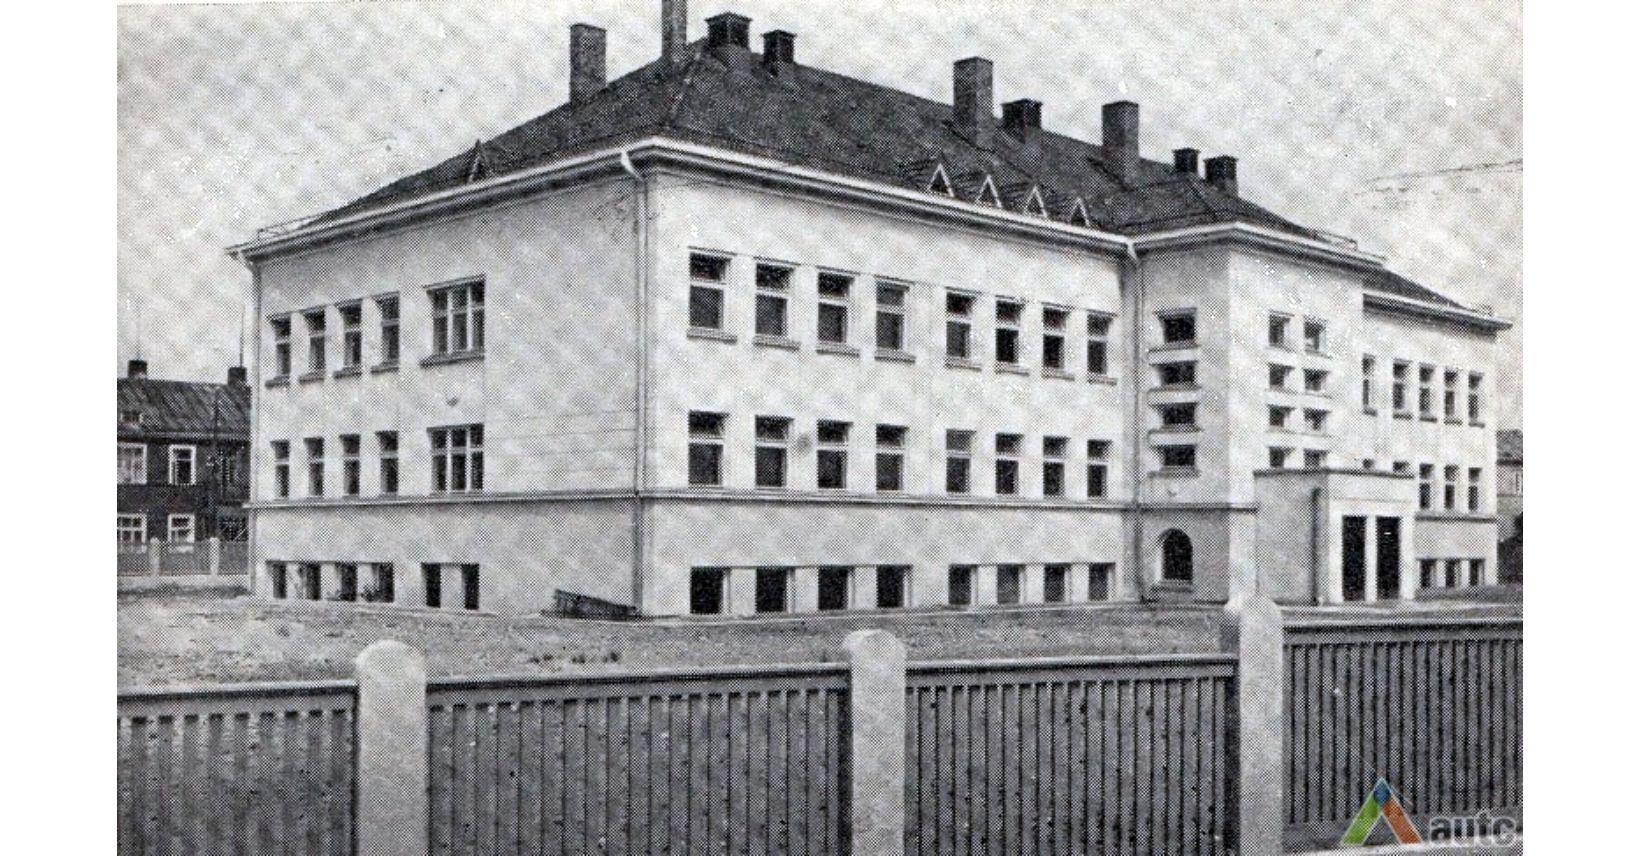 sanciu II pradzios mokykla istorine